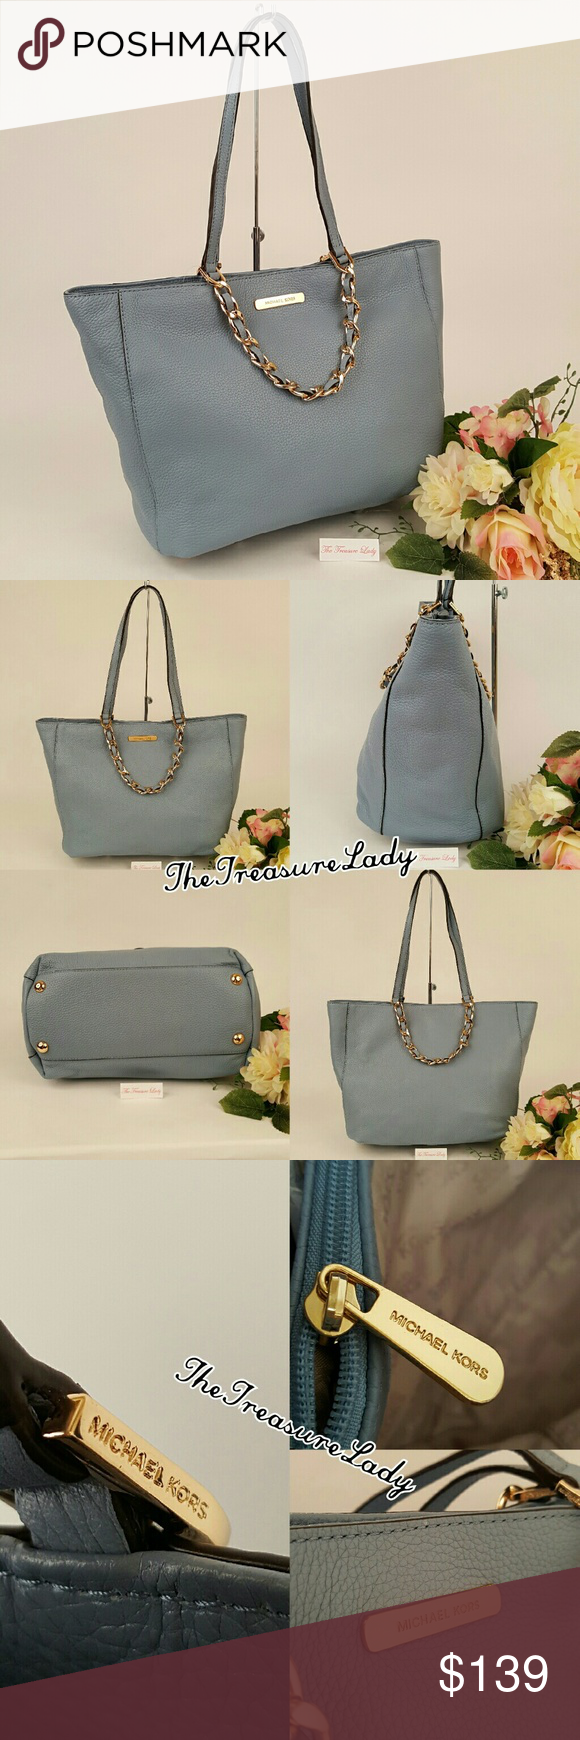 5e897a84ba01 Michael Kors Harper Blue Tote Leather Purse bag *Authentic *NWT *Style #  35H5GRPT7E